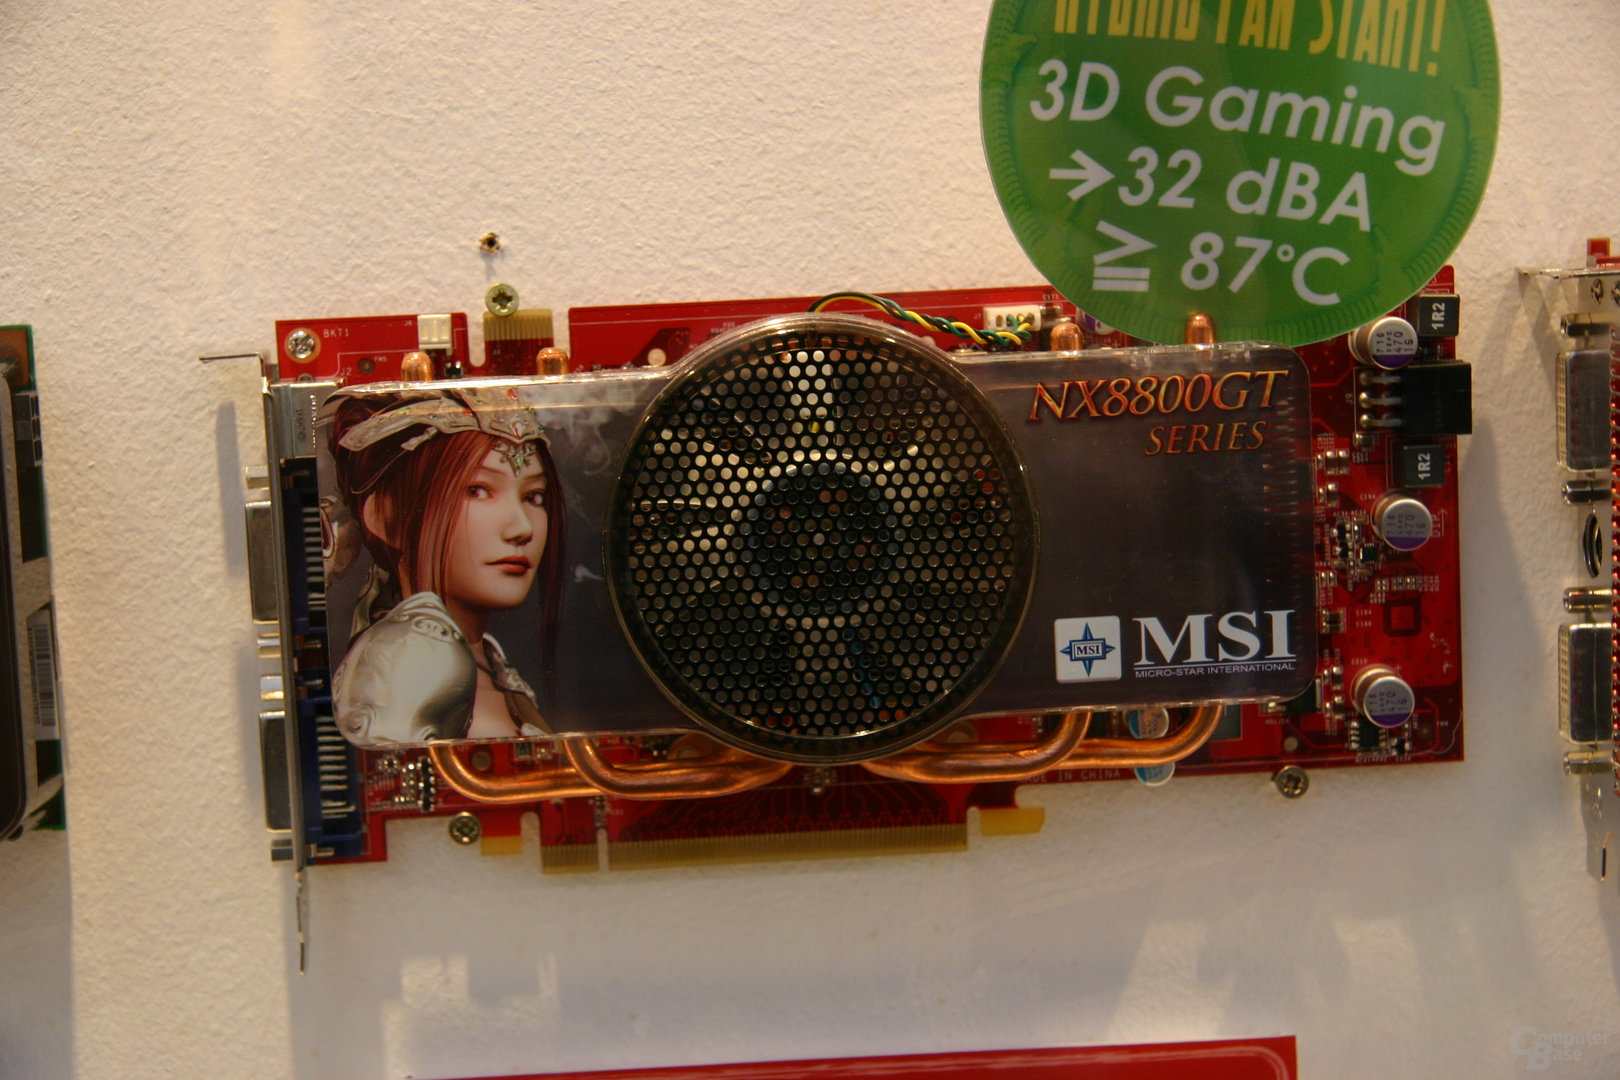 MSI GeForce 8800 GT Hybrid Freezer